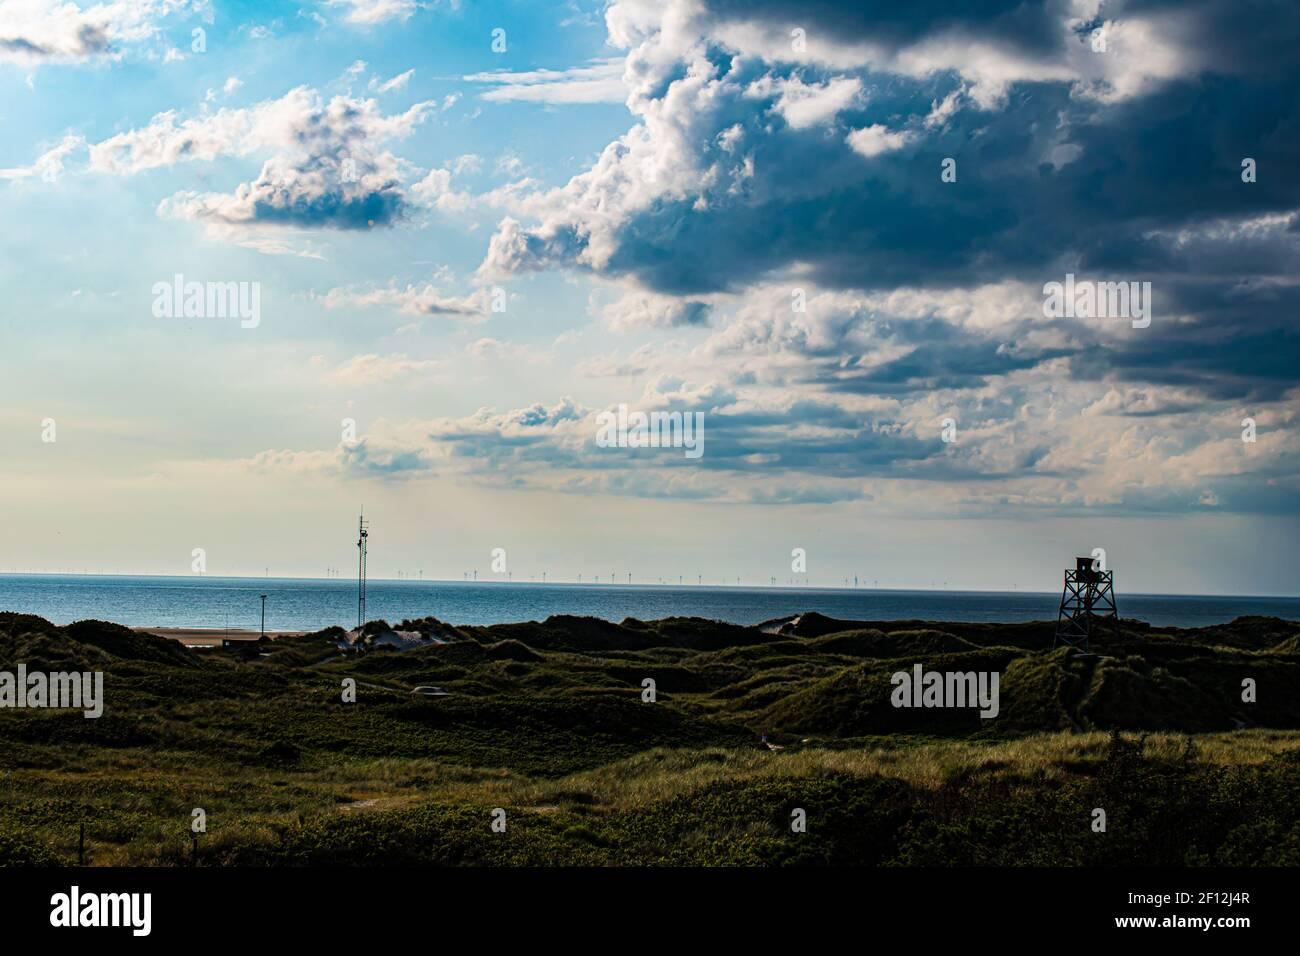 Sand dunes of Blavand beach in Denmark with watch tower Stock Photo